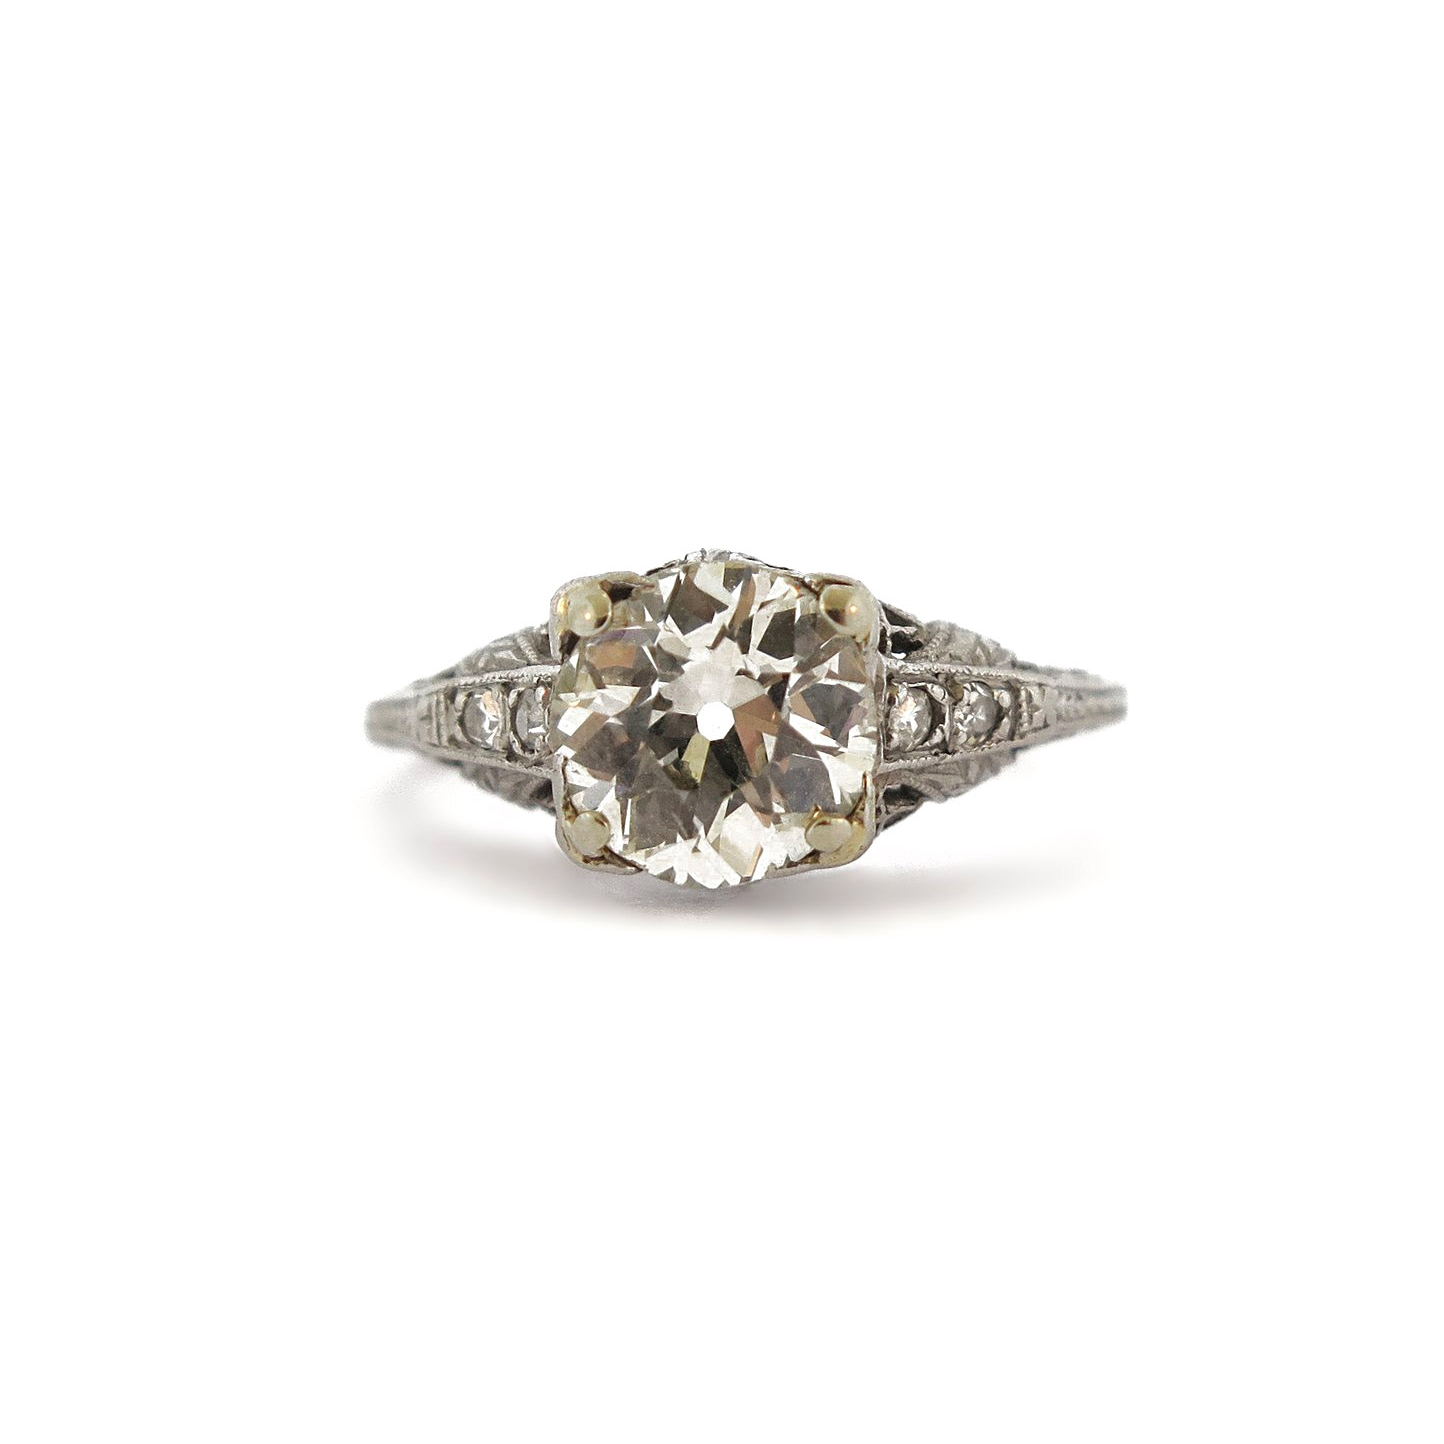 Edwardian Diamond and Side Stones Filigree Platinum Ring